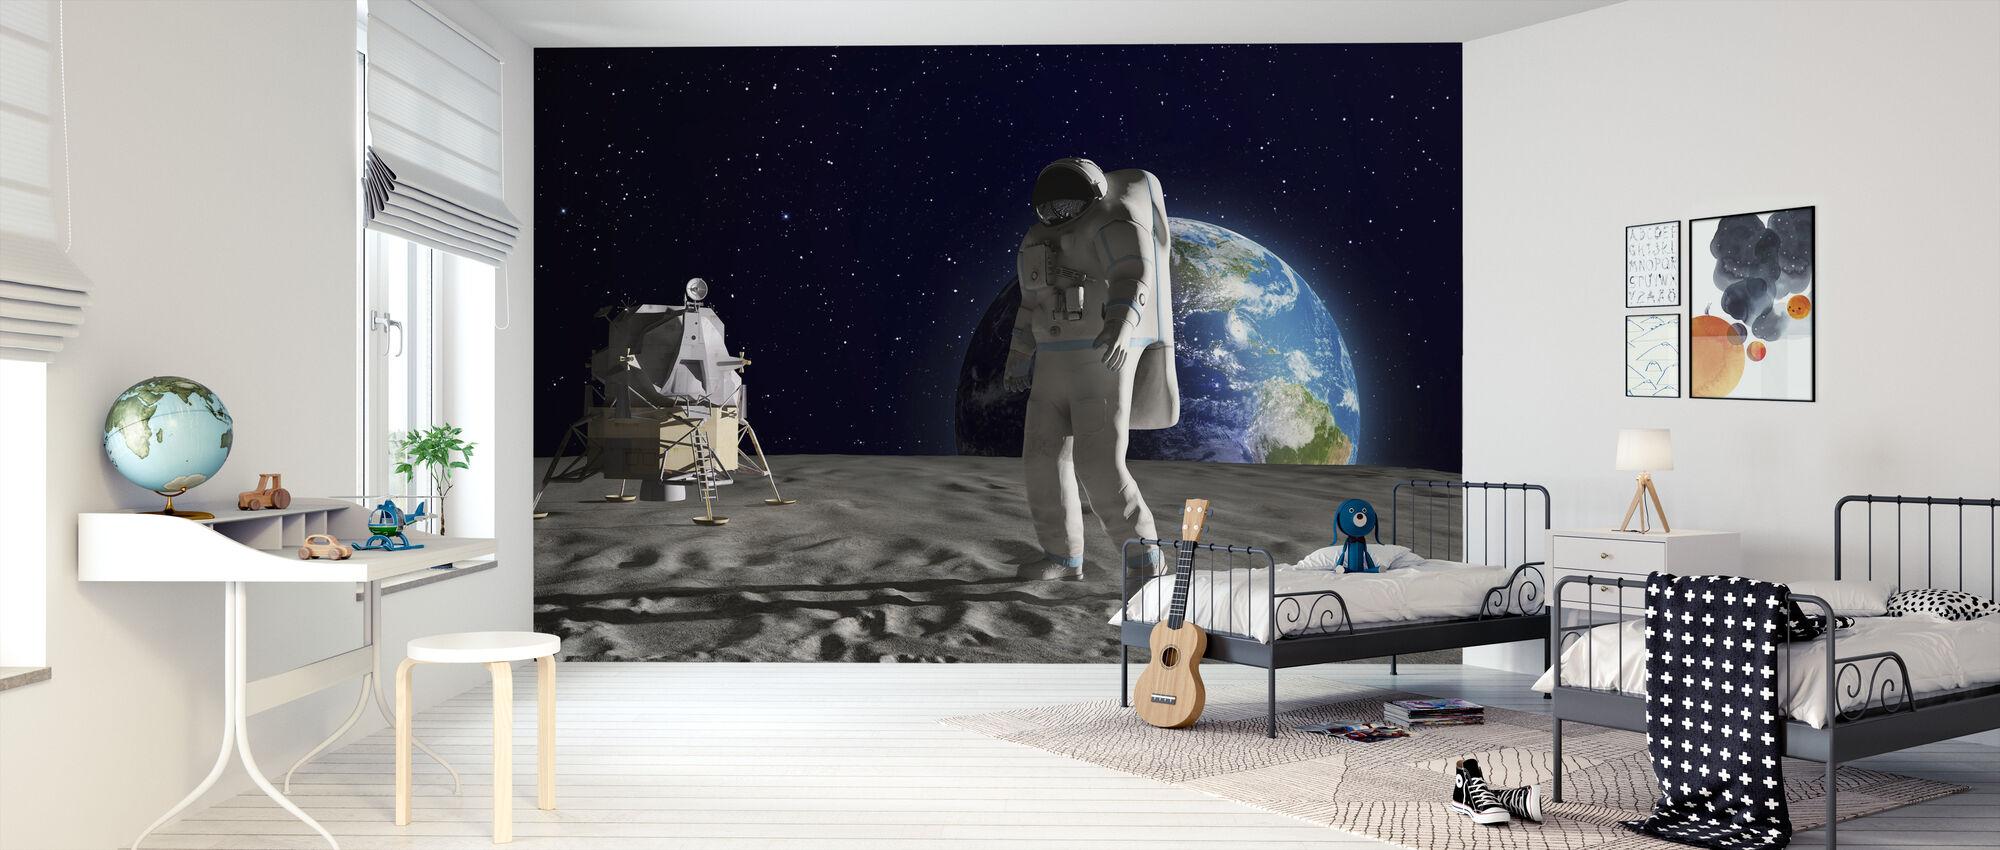 Astronaut on the Moon - Wallpaper - Kids Room